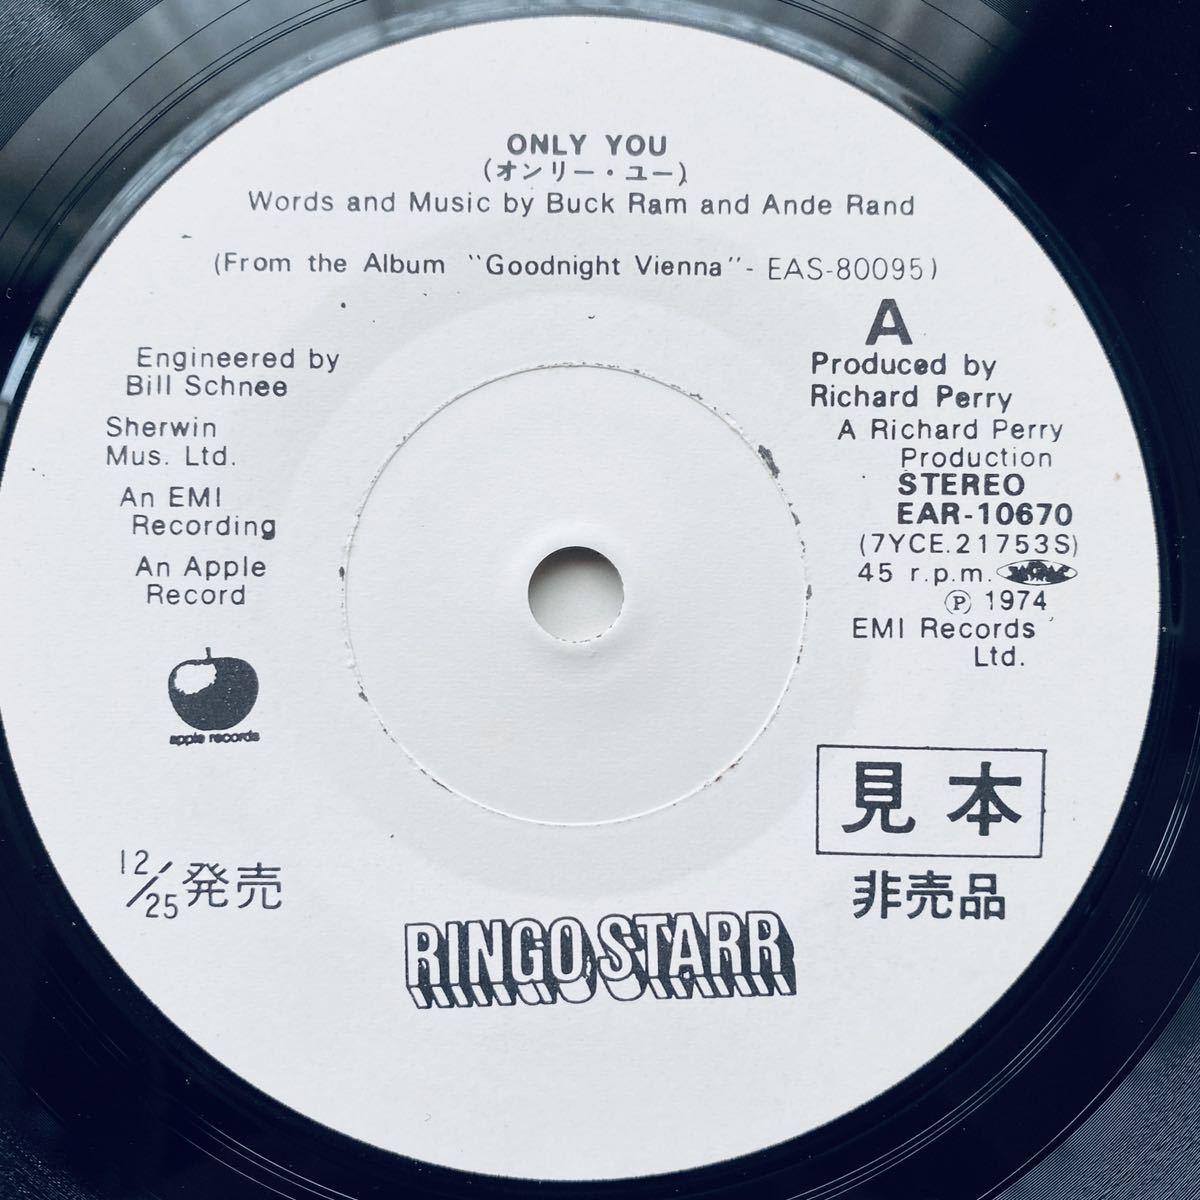 EP / リンゴ・スター - オンリー・ユー / 国内見本盤白ラベル プロモ 非売品 EAR-10670 RINGO STARR - ONLY YOU / Apple ビートルズ_画像4